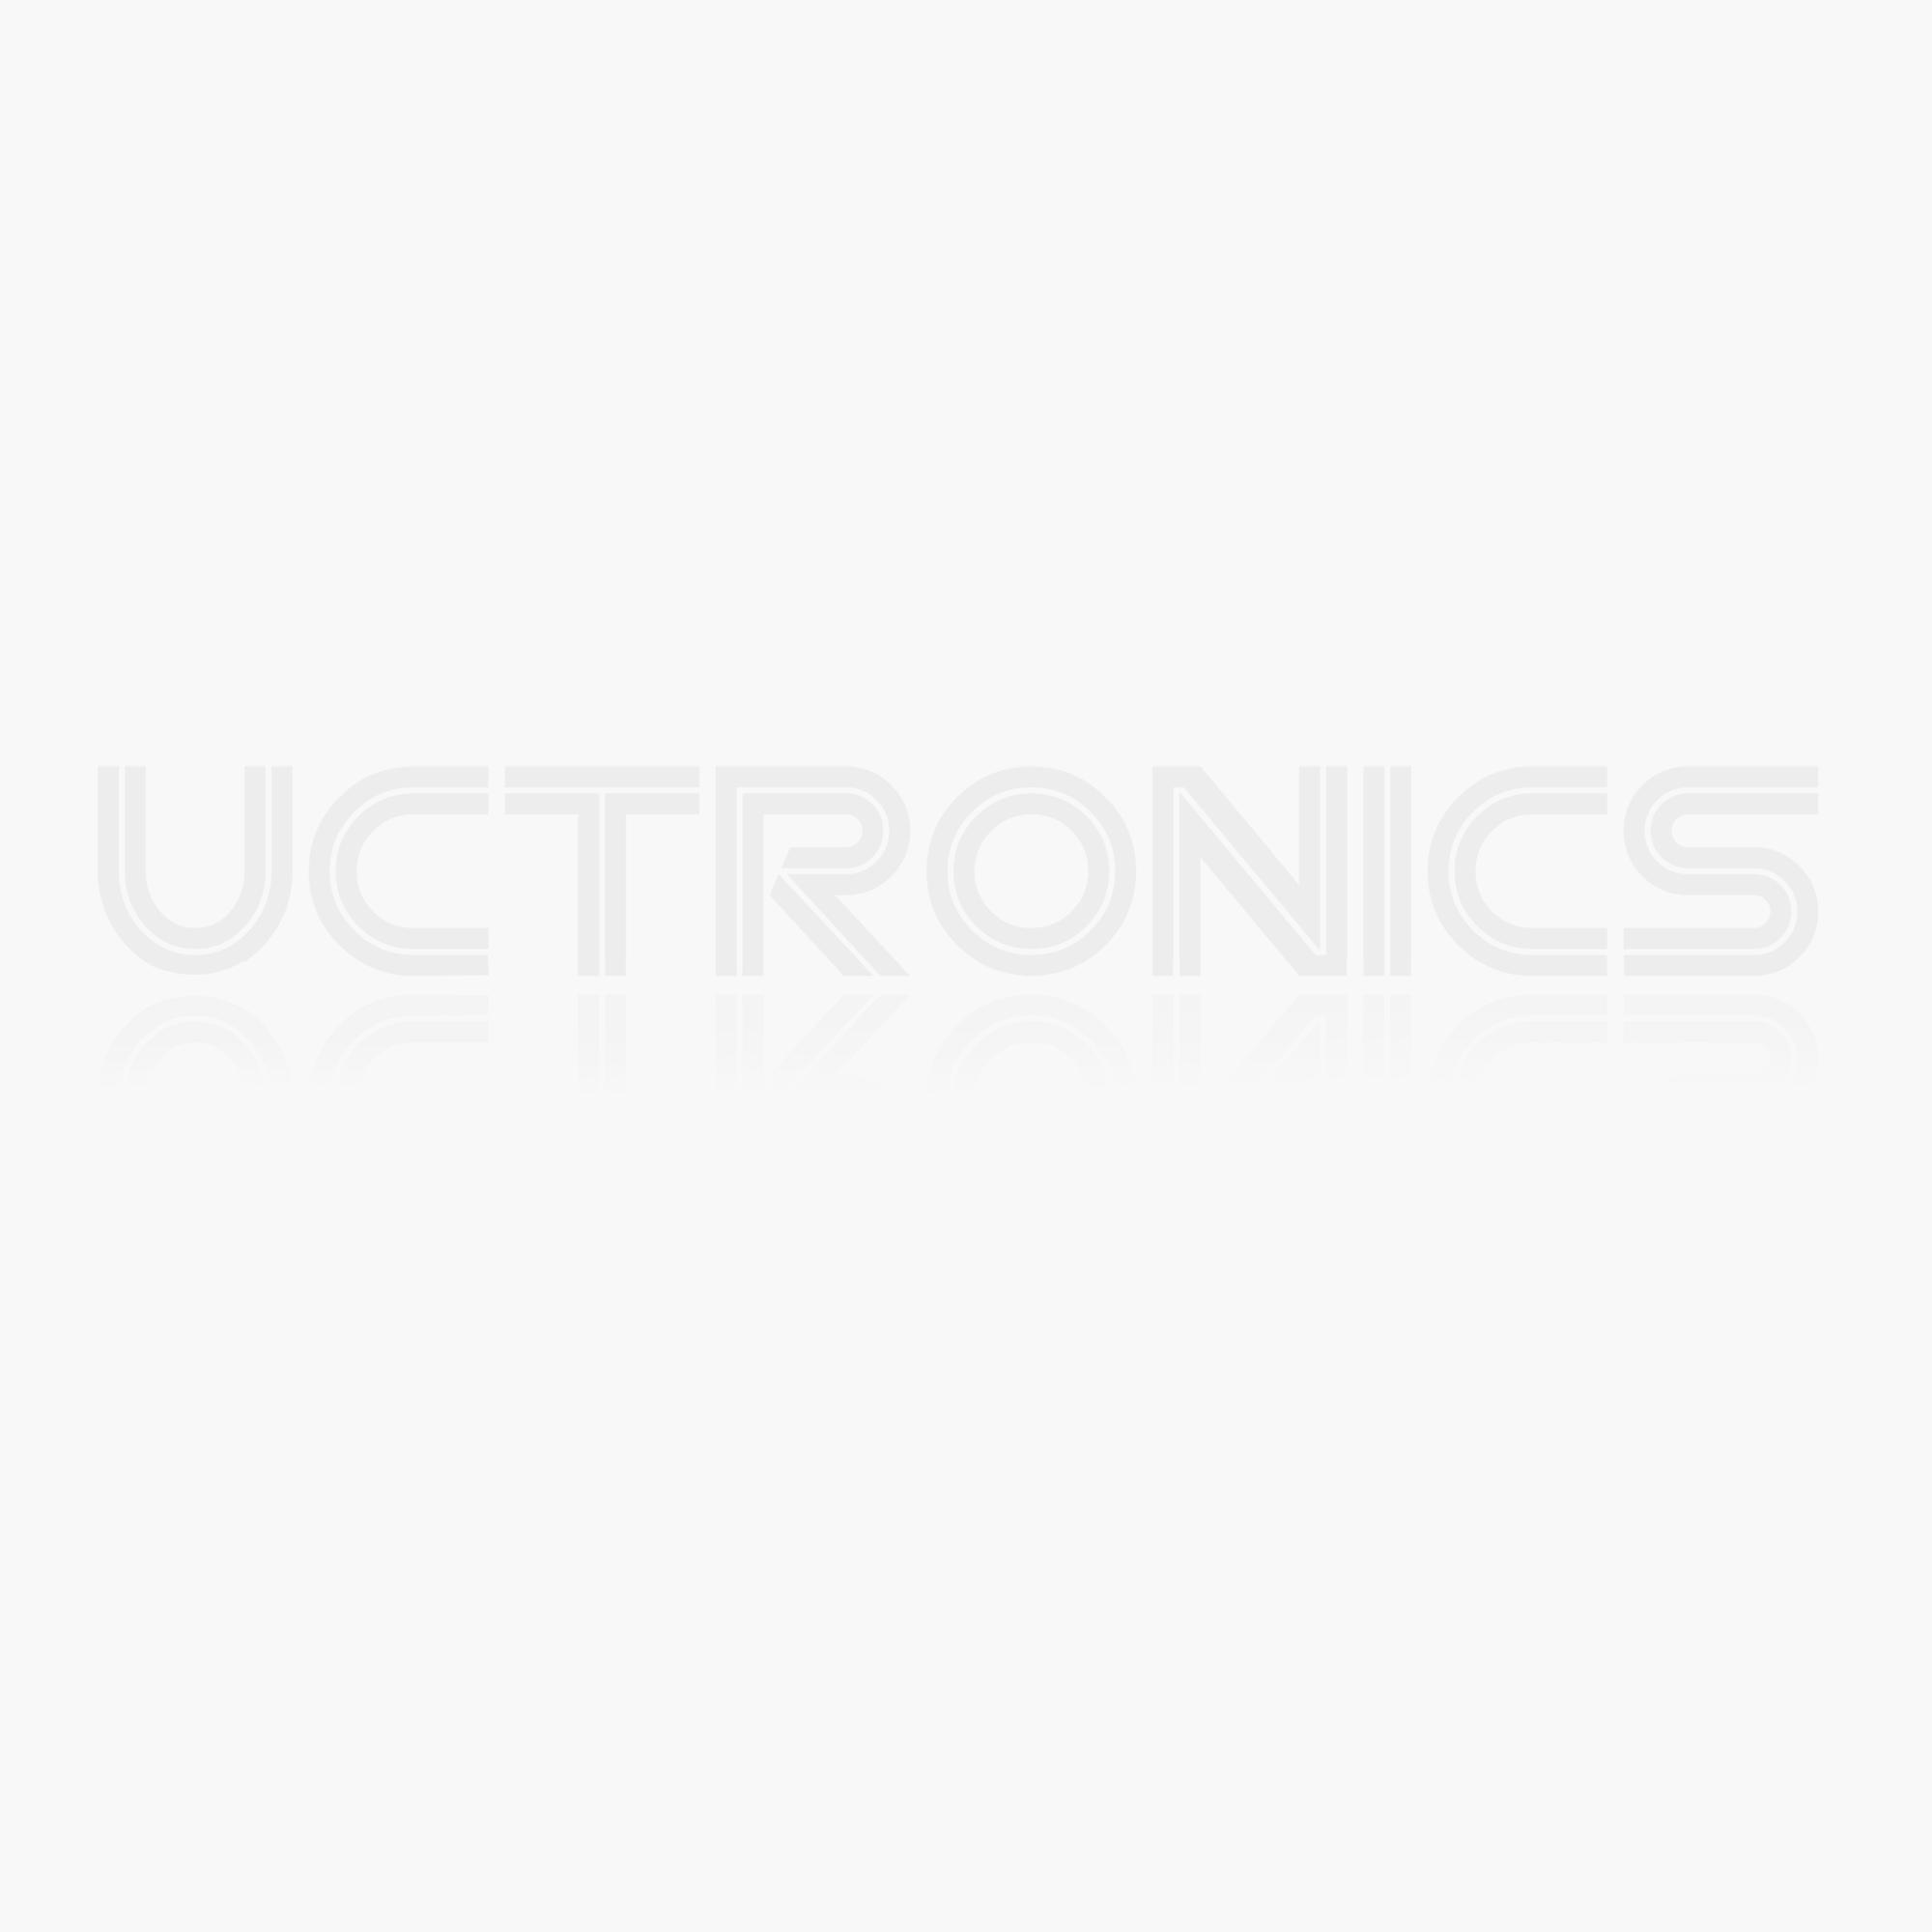 6V 12V 24V 28V 3A PWM DC Motor Speed Controller Module Switch Control 1203B